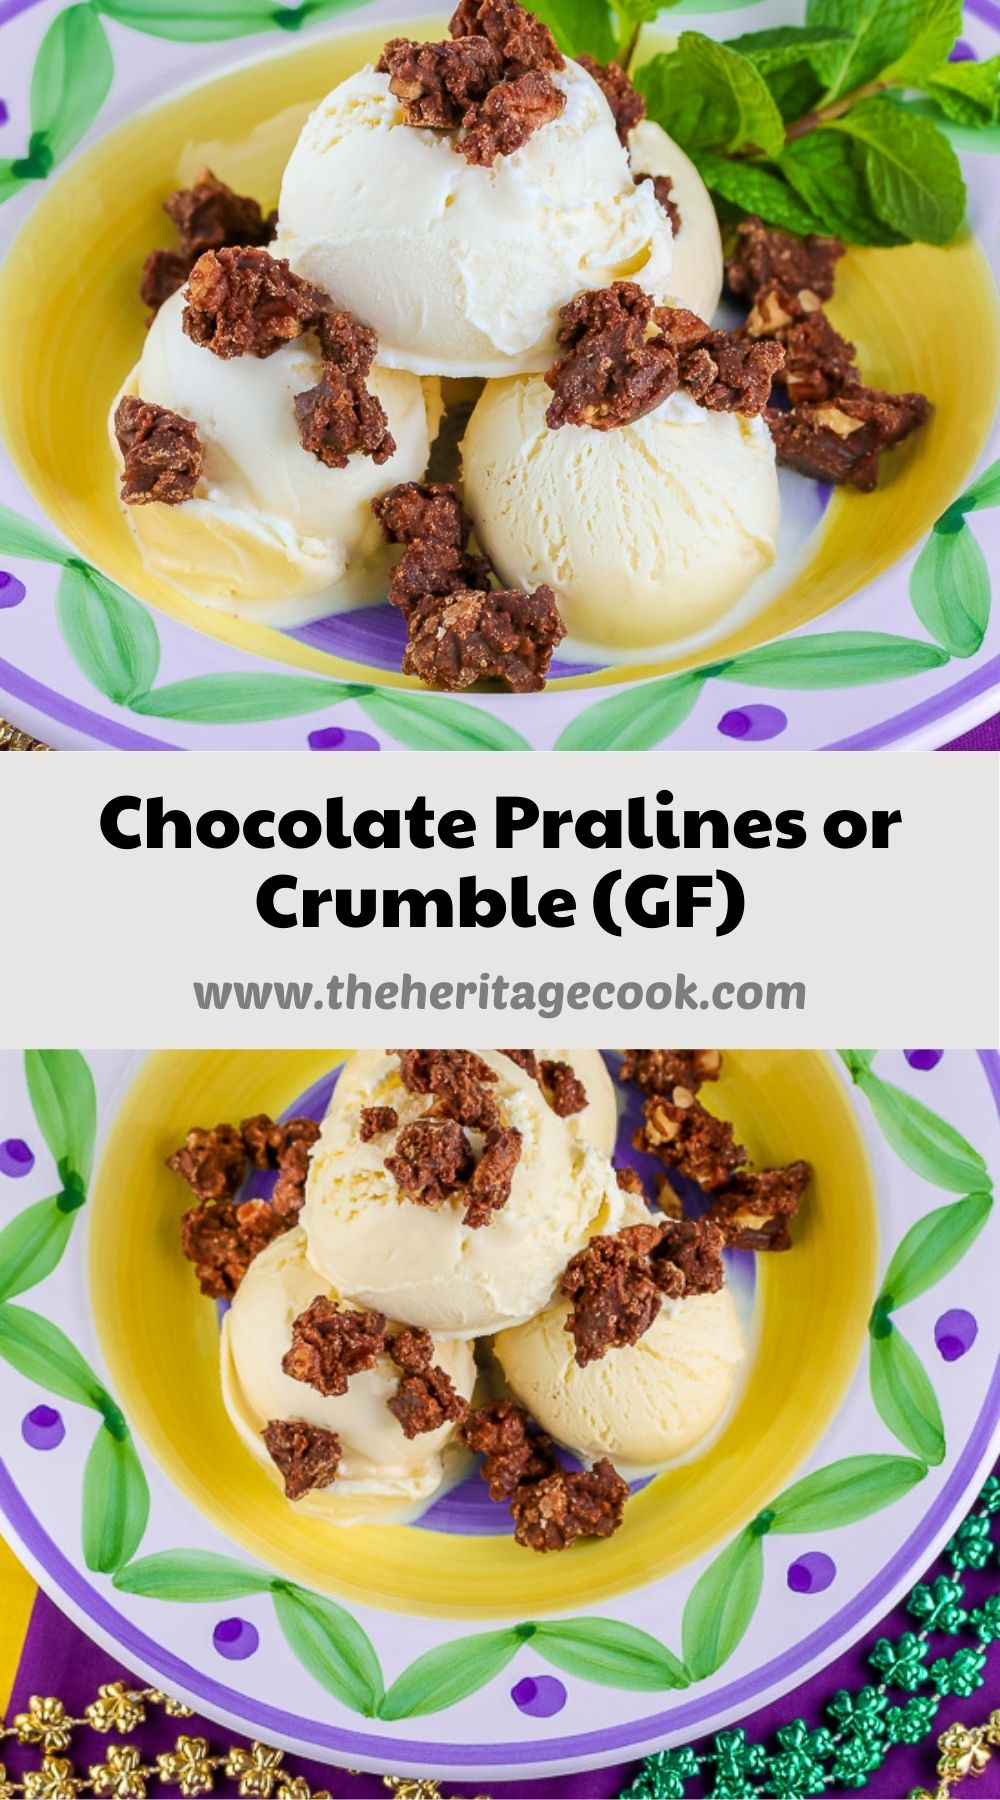 Mardi Gras Chocolate Pralines or Crumble (Gluten-Free) © 2021 Jane Bonacci, The Heritage Cook